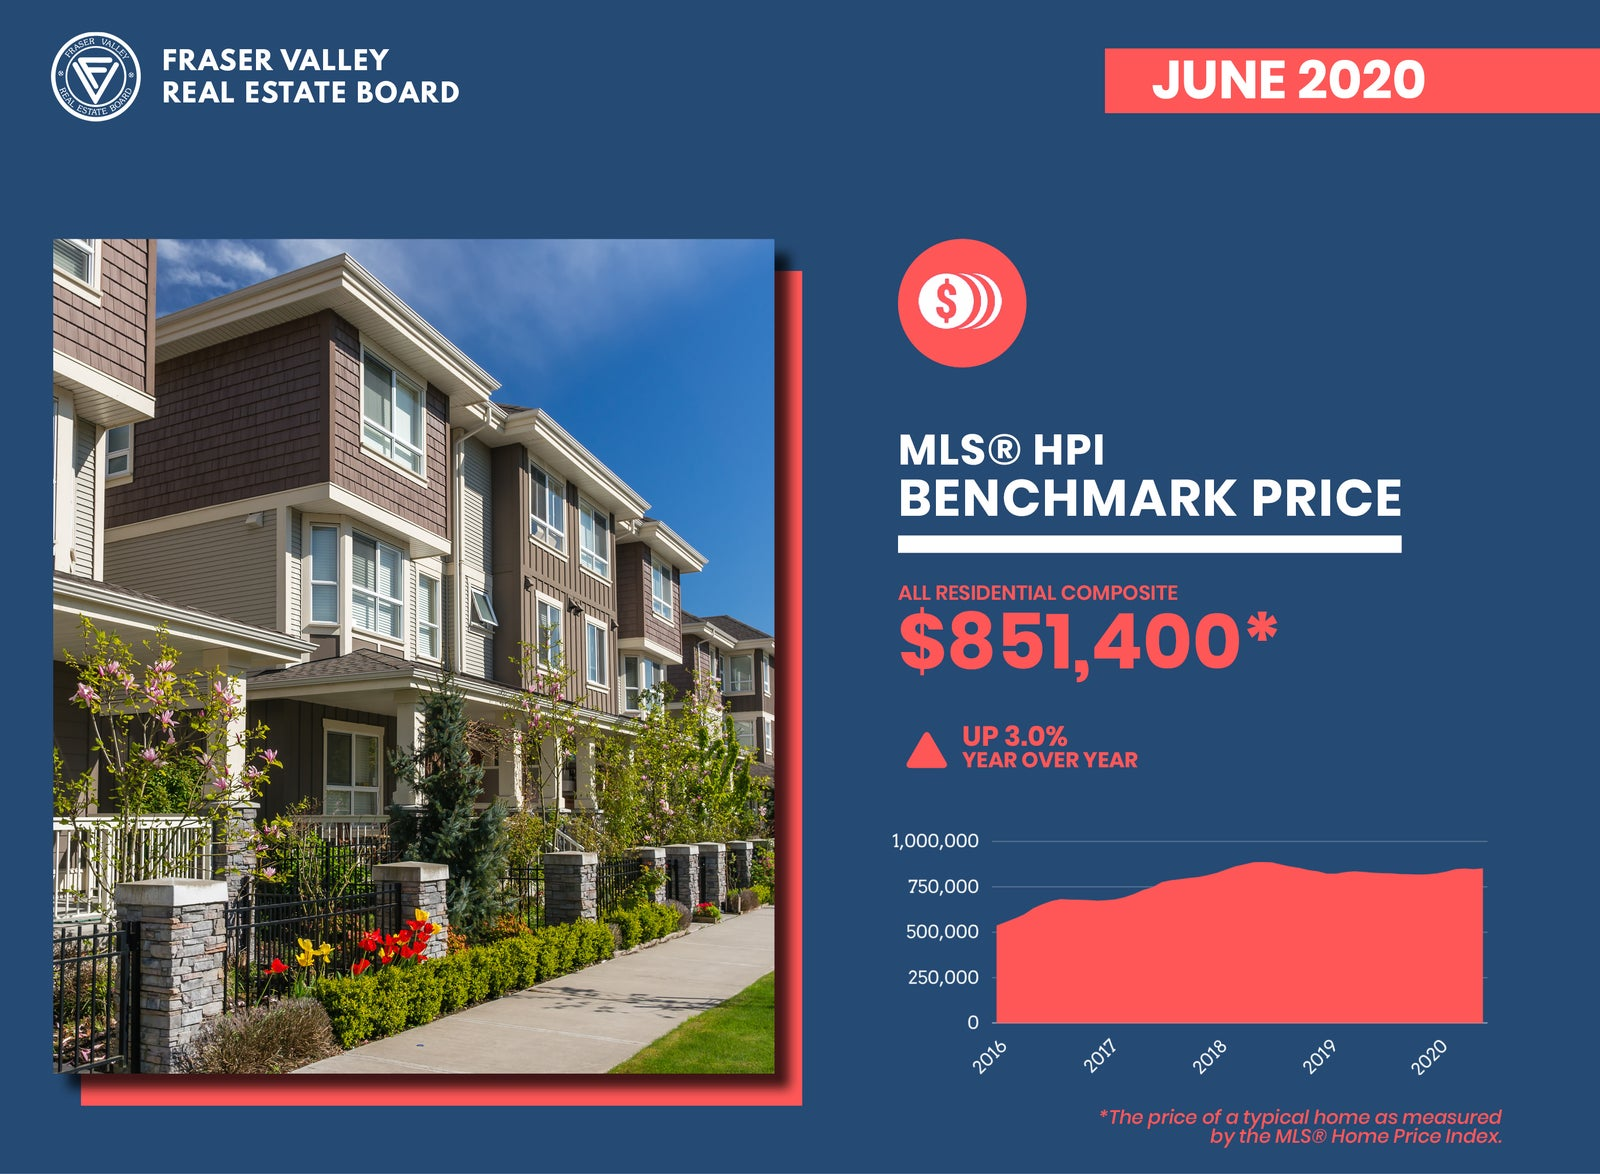 Benchmark price - Fraser Valley Real Estate Board June 2020